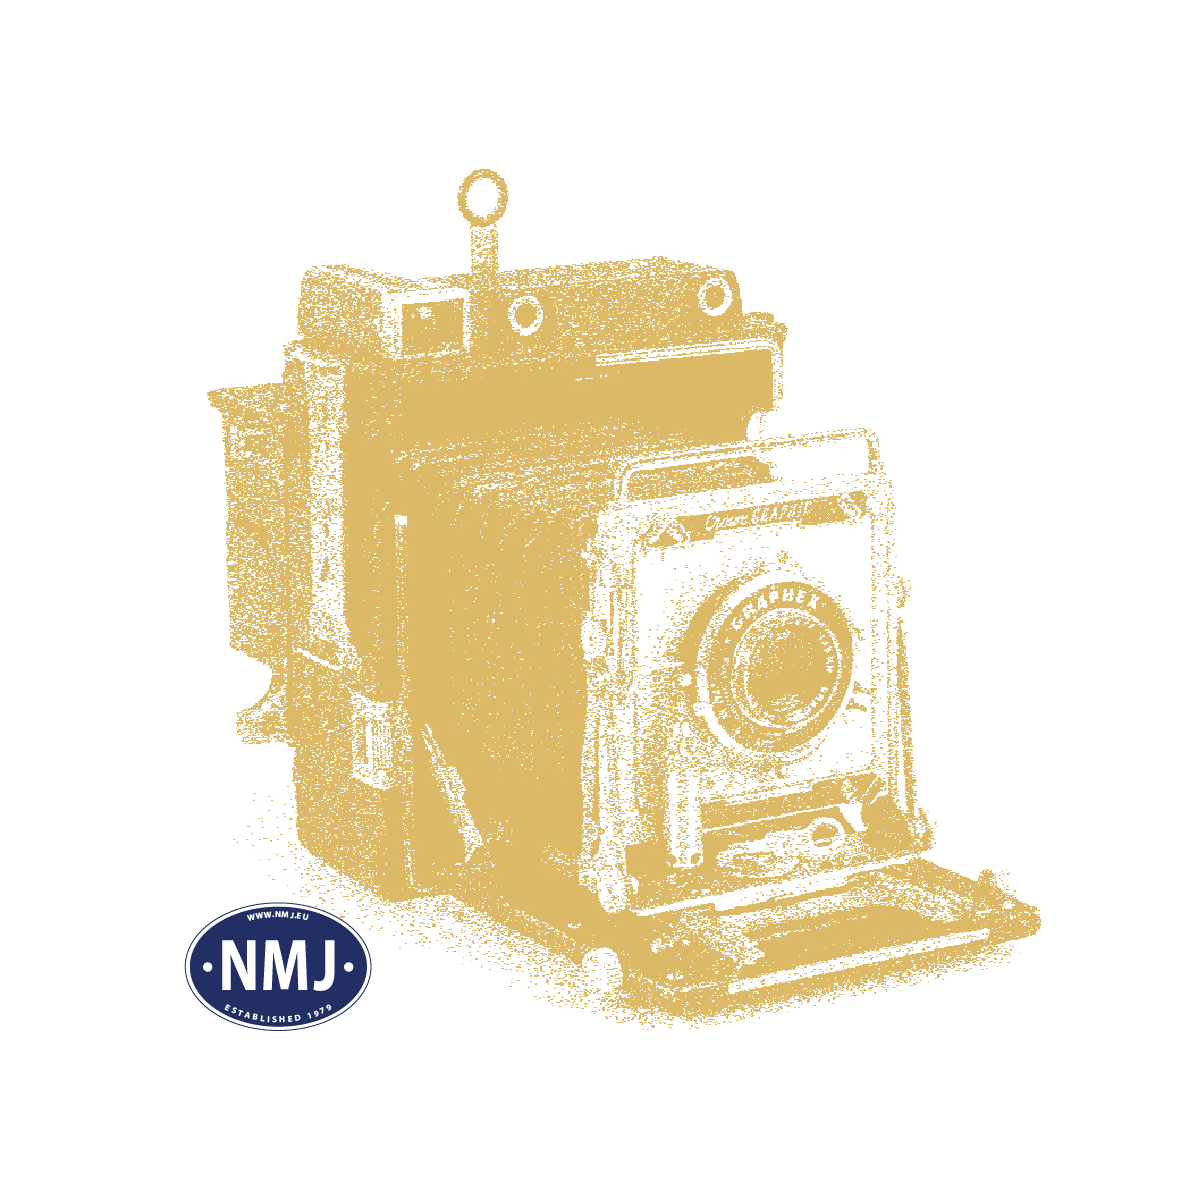 NMJS2.2024-1 - NMJ Superline NSB El 2.2024, Original livery